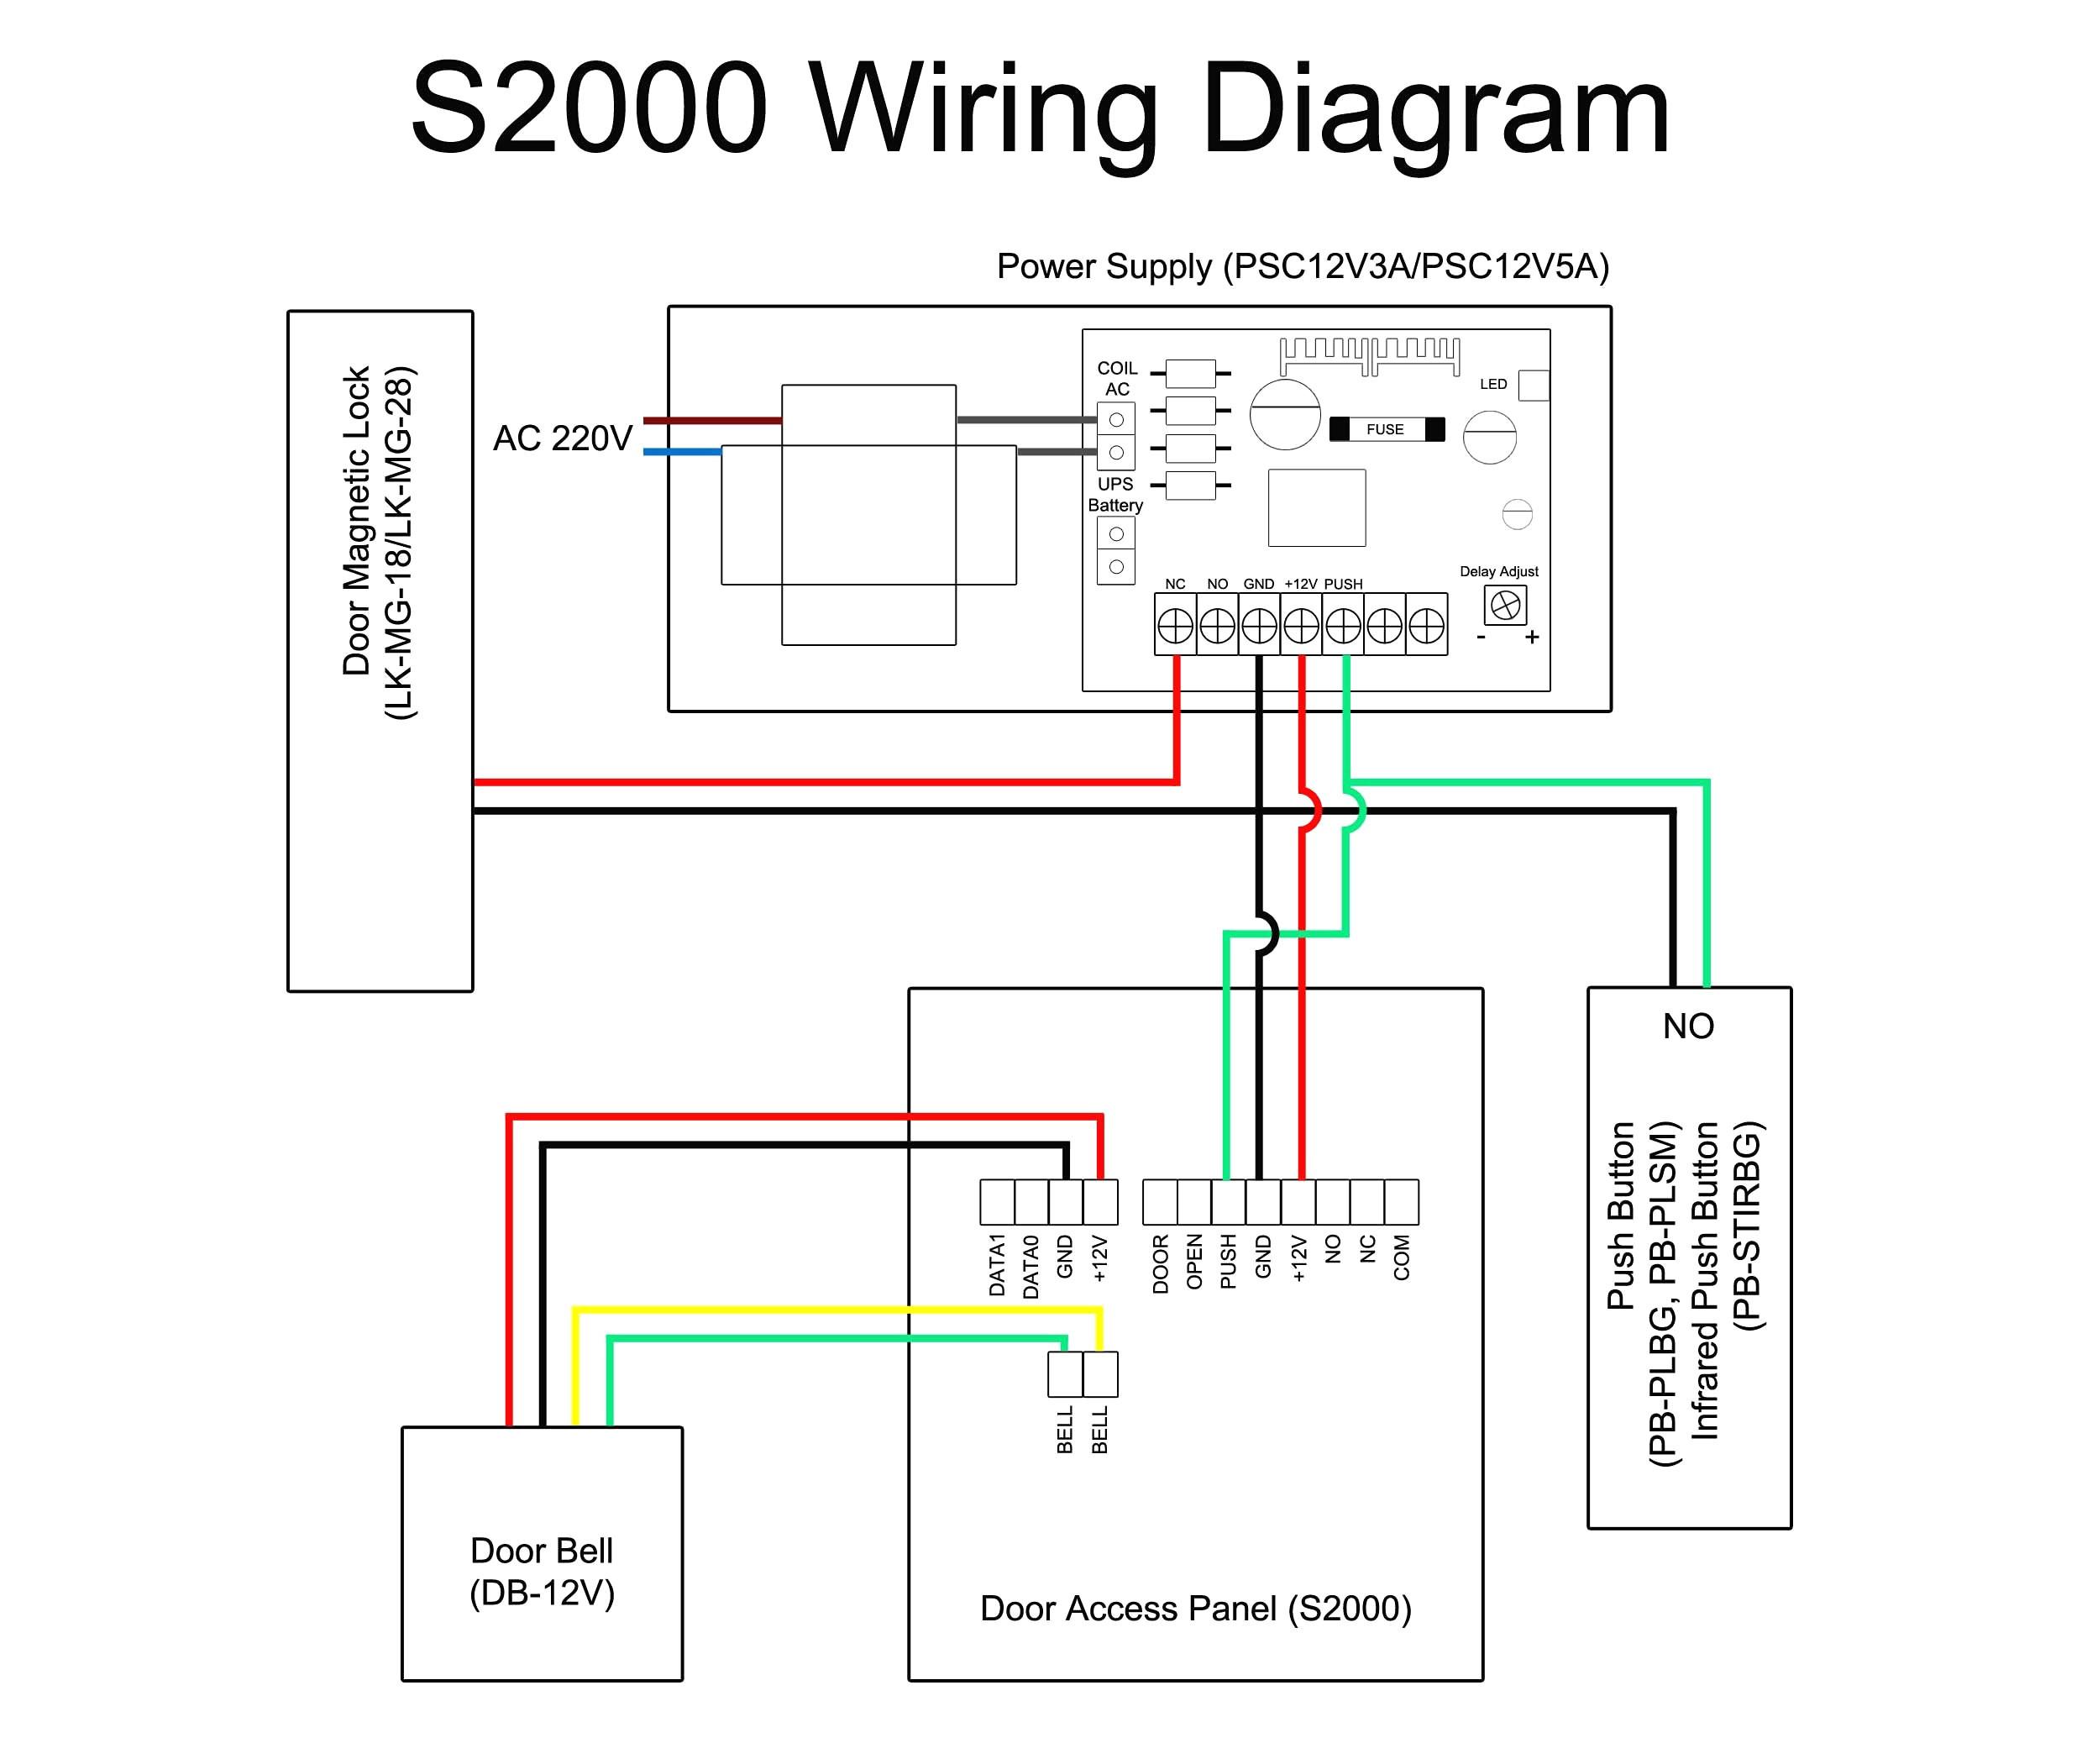 ip camera wiring diagram pioneer premier car stereo download sample